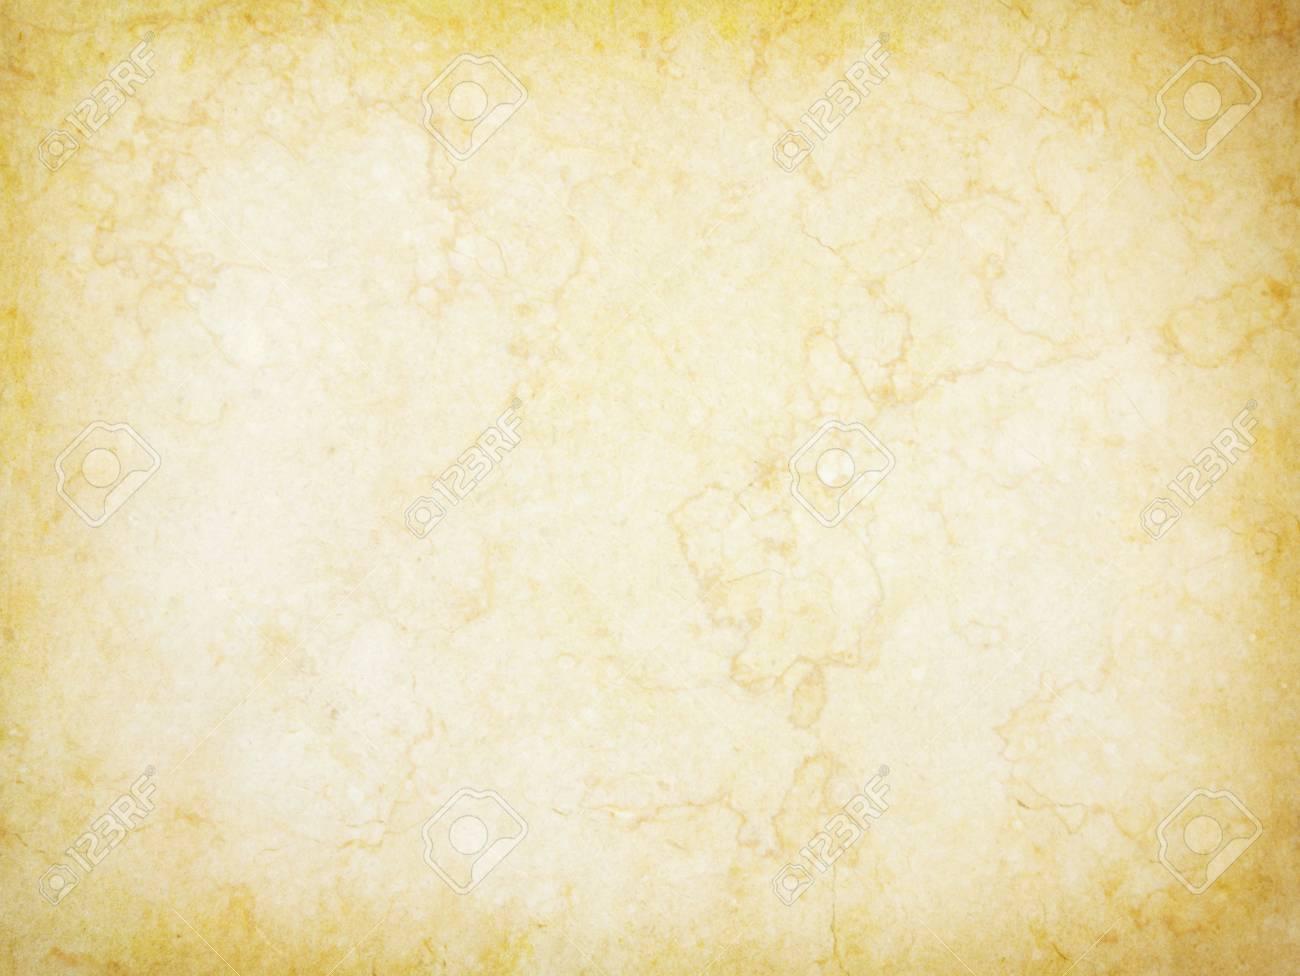 antique cracked paper texture Stock Photo - 27613838